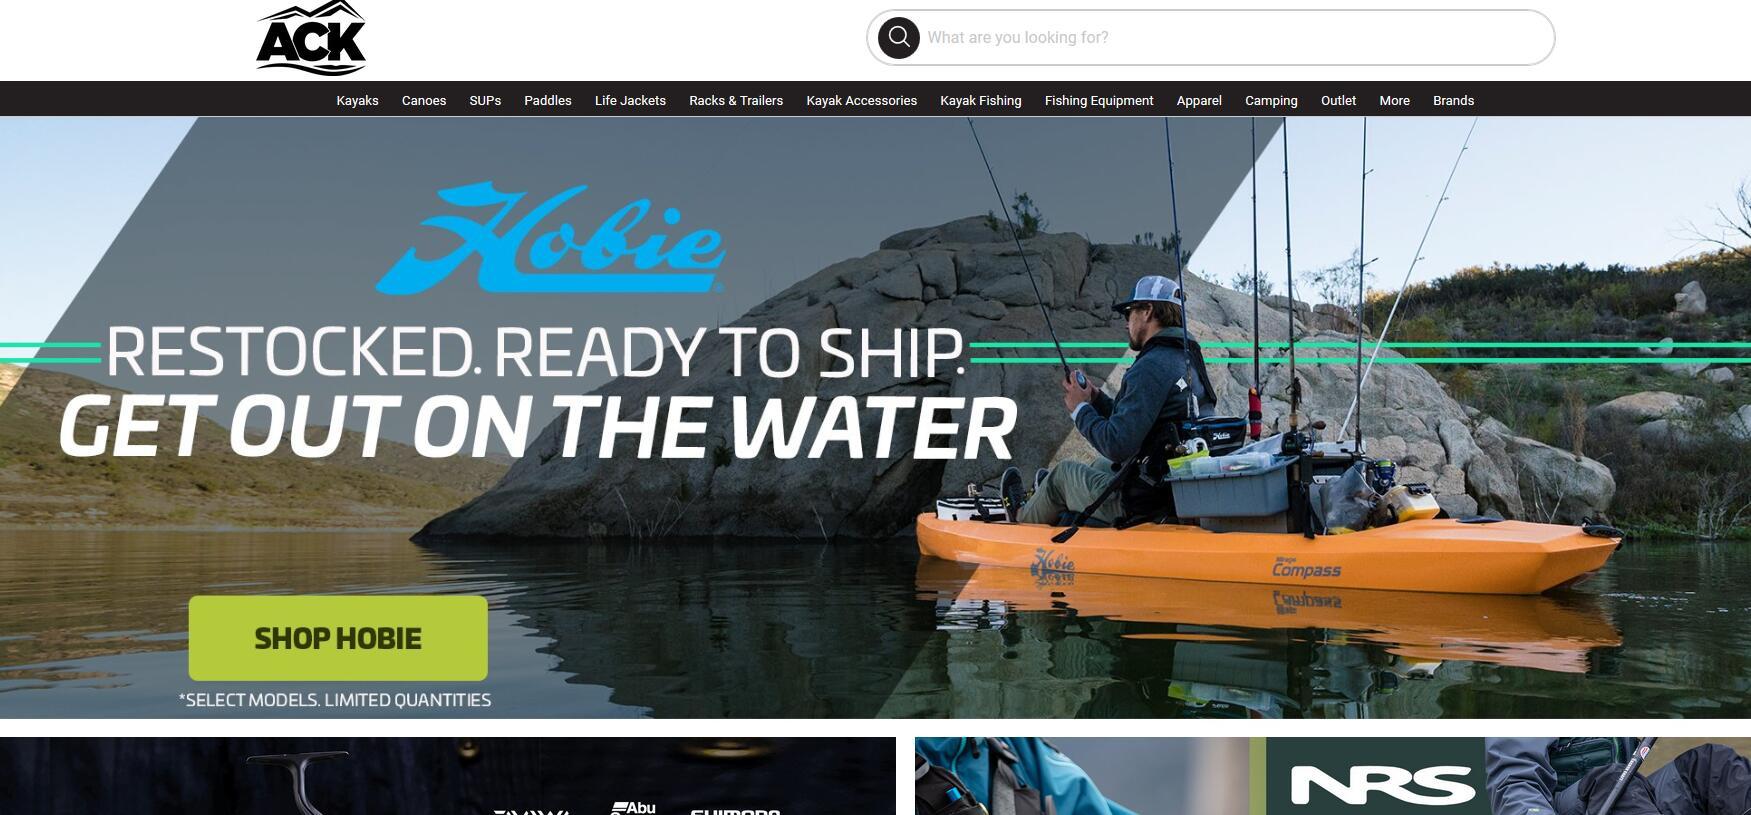 Austin Canoe & Kayak美国官网 ACK户外运动用品海淘网站